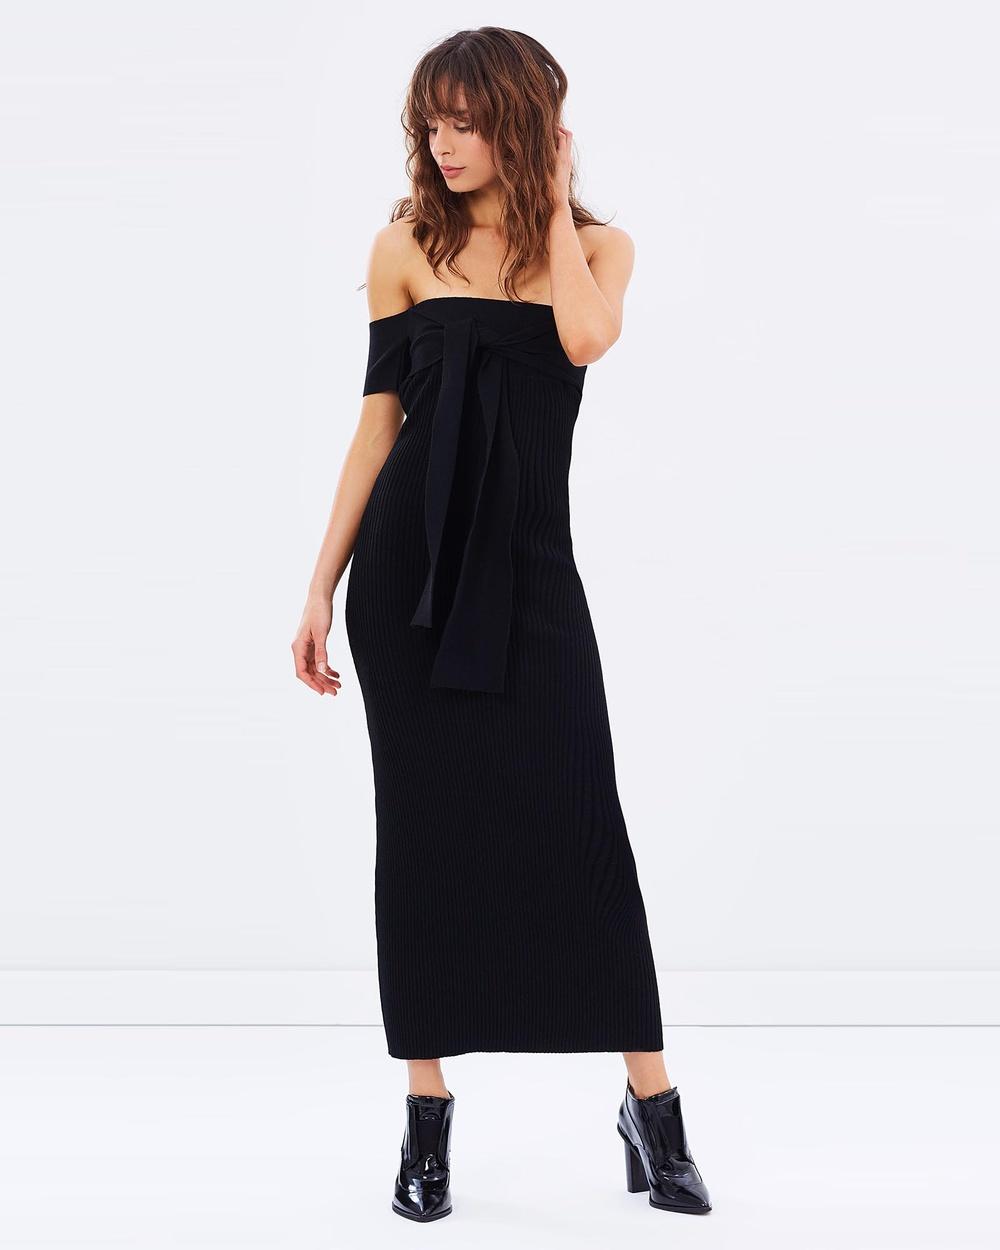 Friend of Audrey Escada Off Shoulder Knit Dress Bodycon Dresses Black Escada Off Shoulder Knit Dress